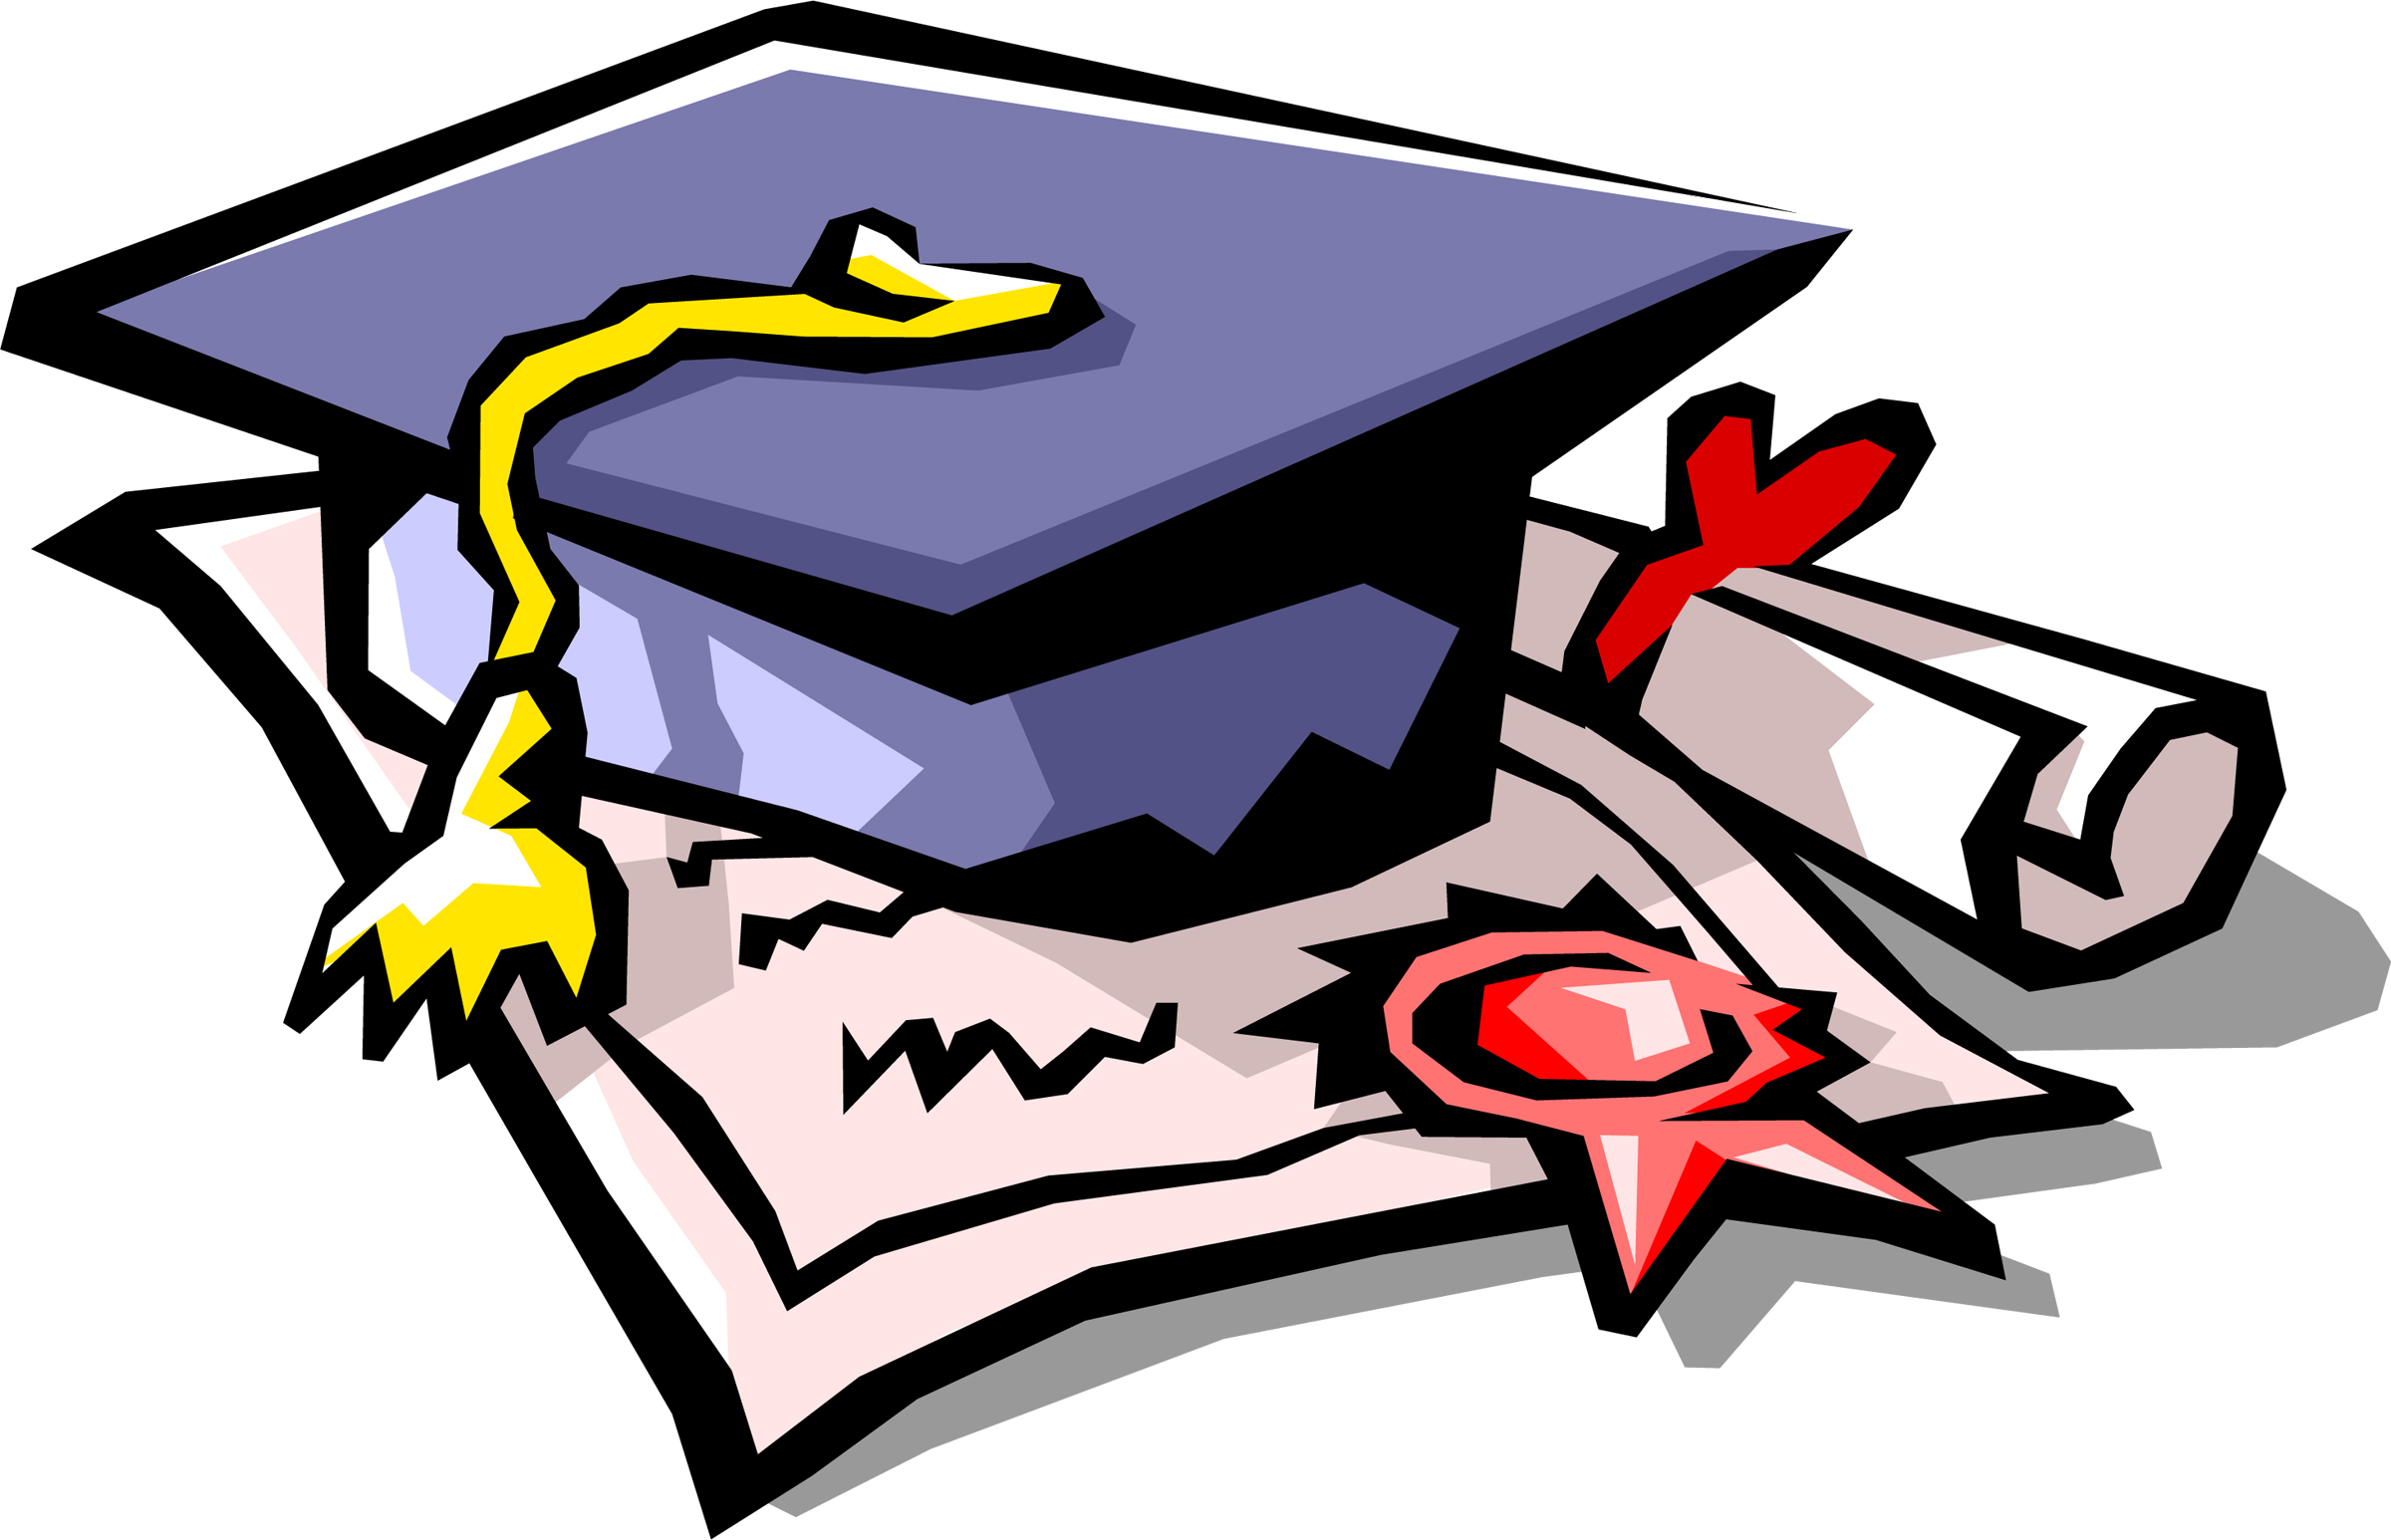 Free graduate cliparts download. Congratulations clipart degree